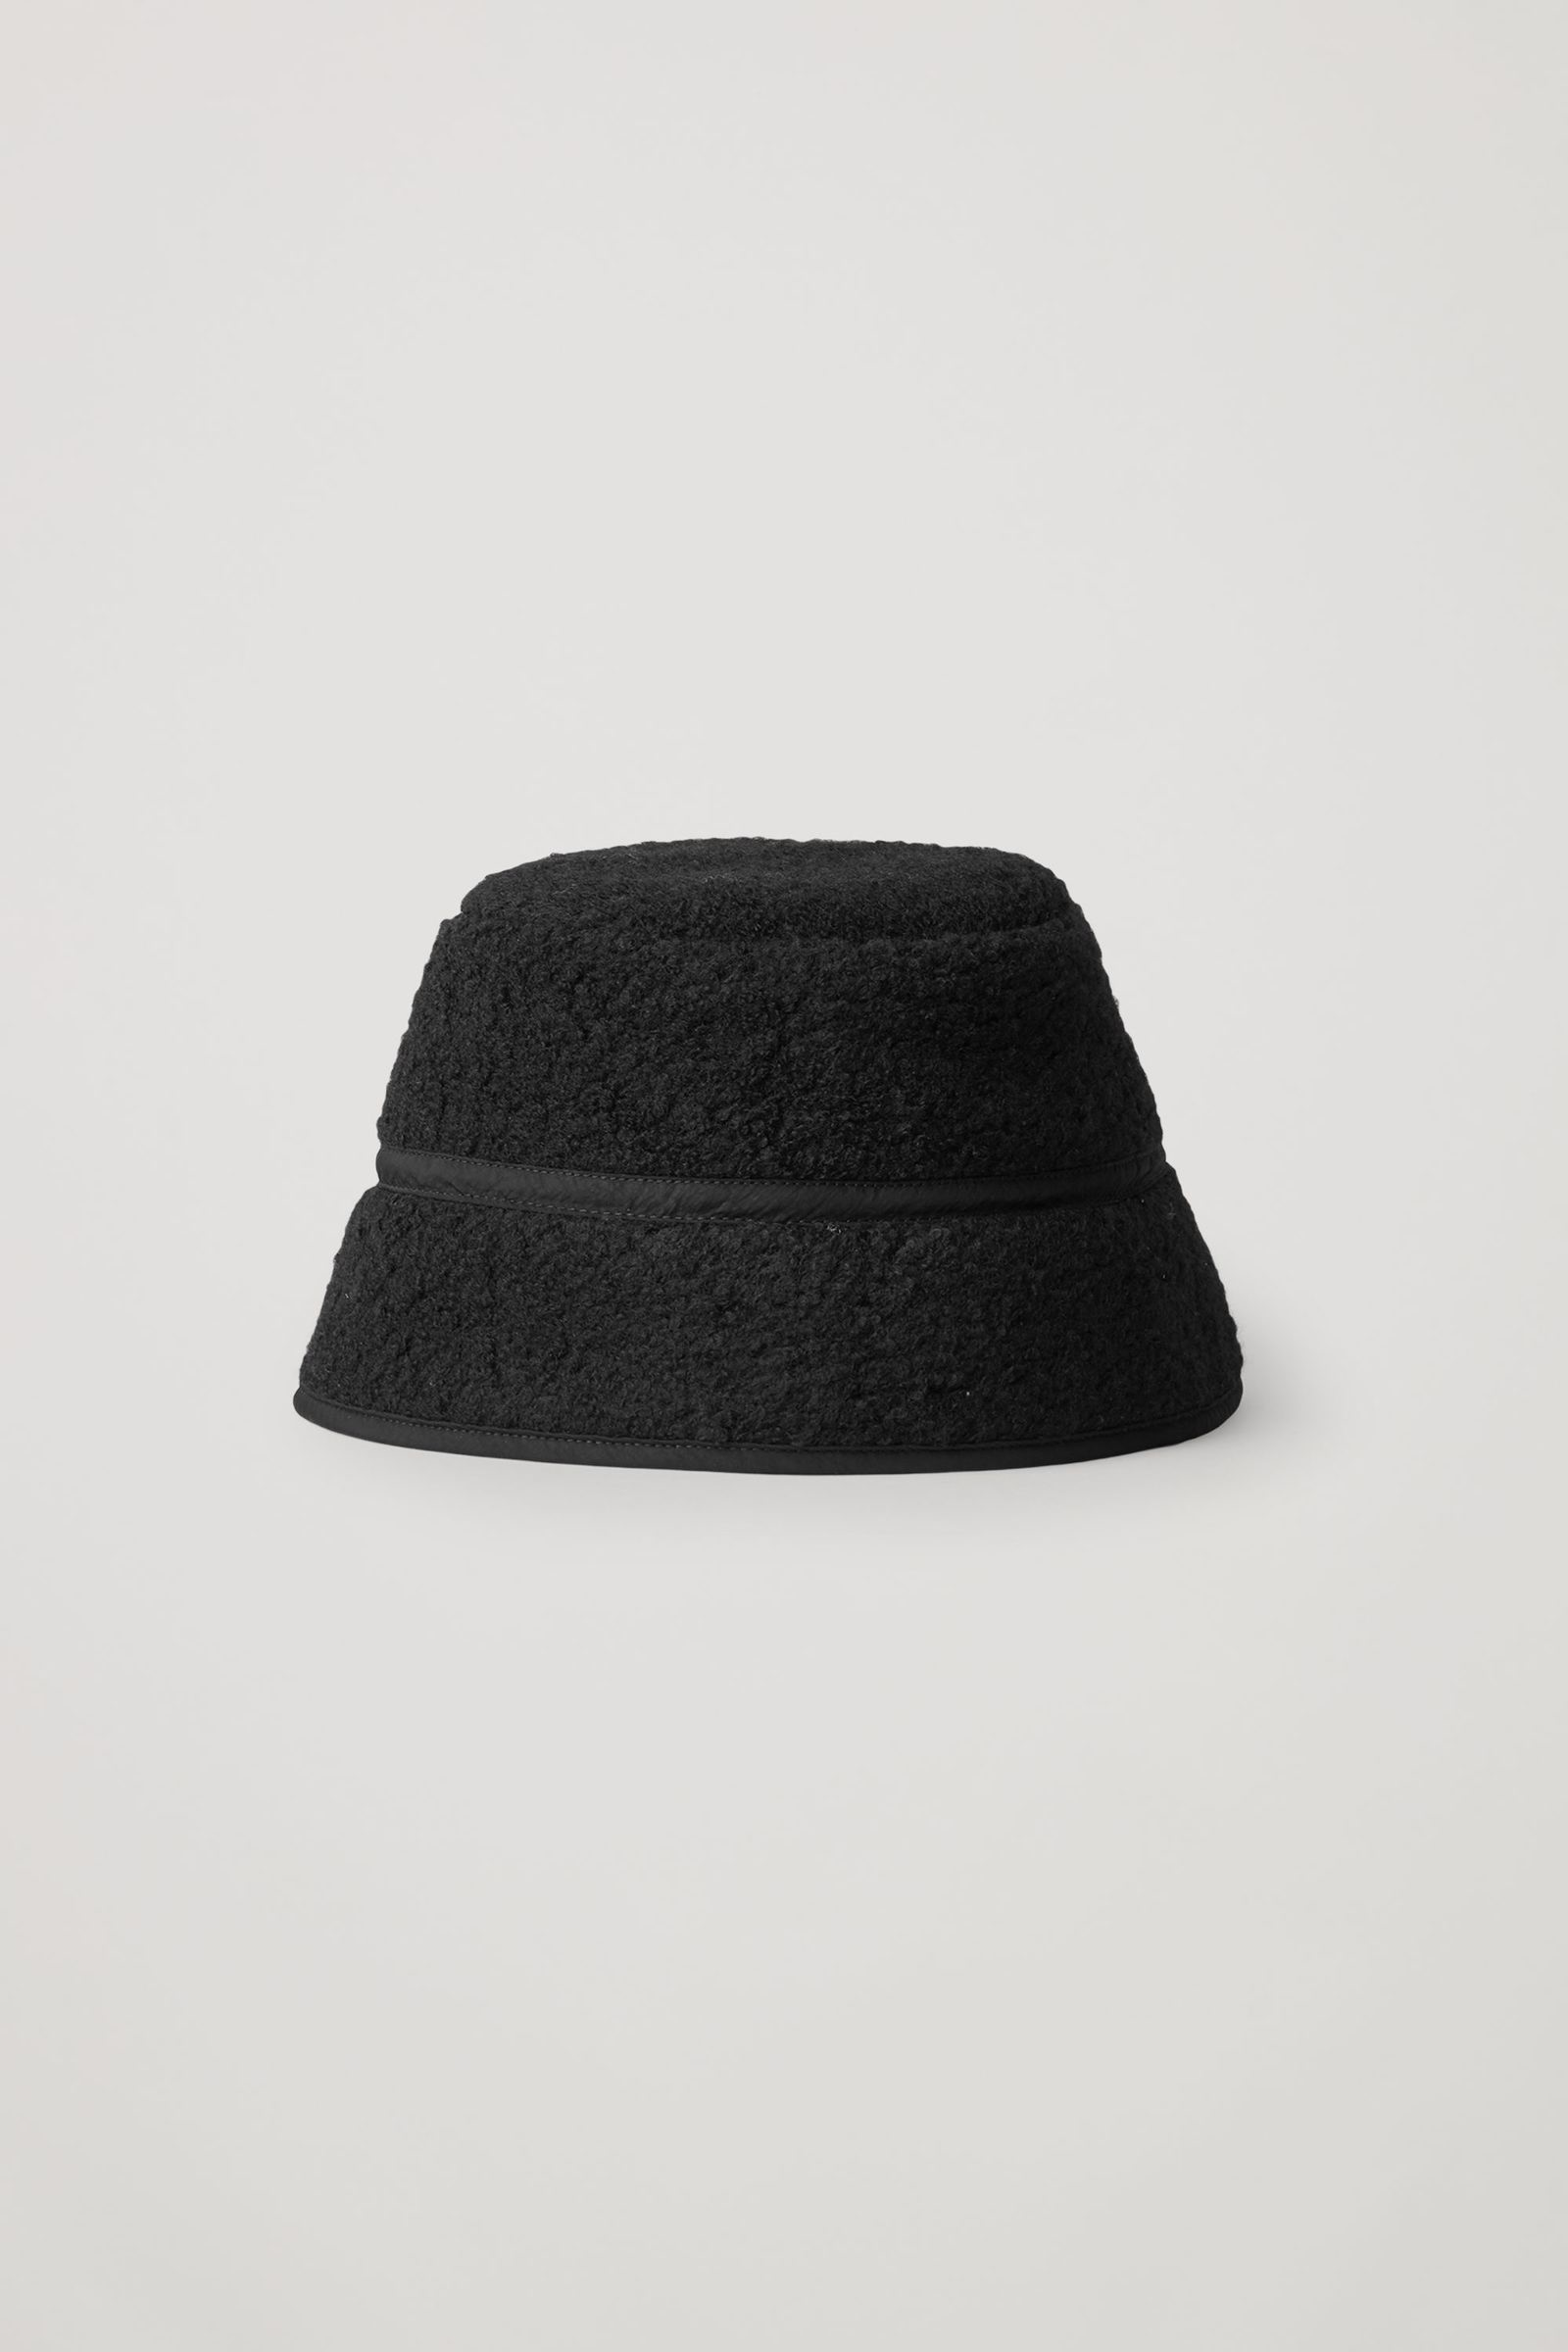 COS 울 믹스 테디 버킷 햇의 블랙컬러 Product입니다.